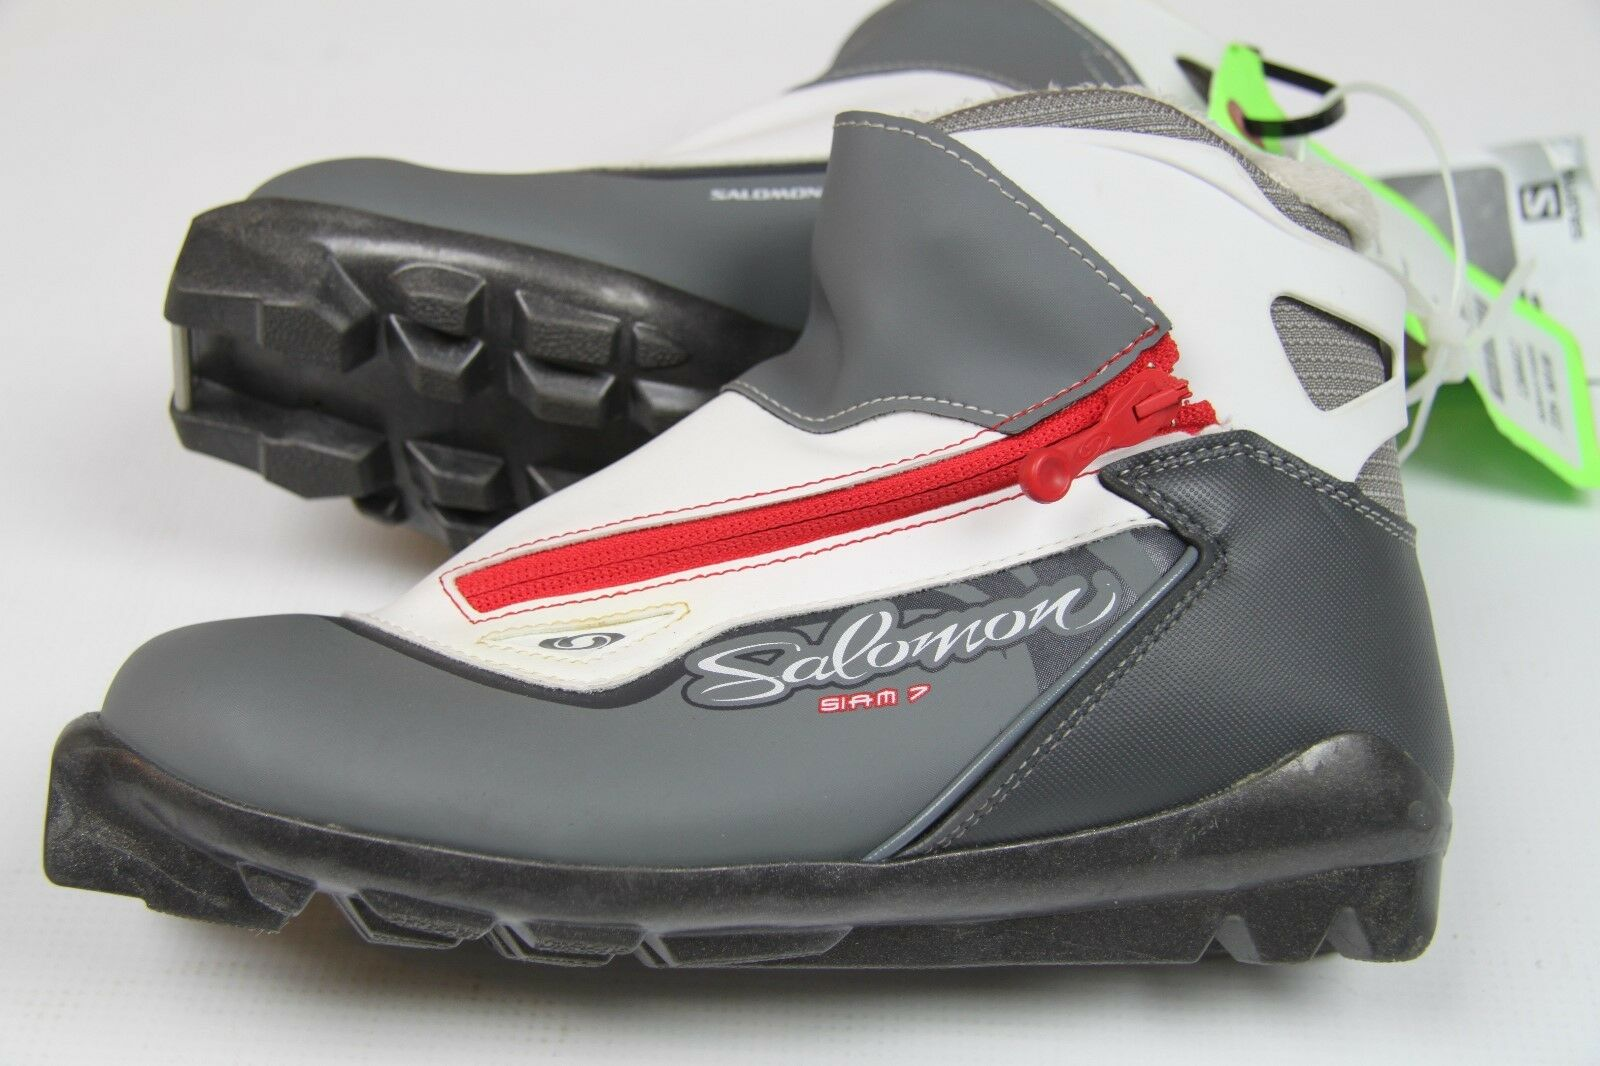 Salomon Siam 7 Pilot Nordic Cross Country Stiefel Größe EUR 37 1 3  US 6 (P141)